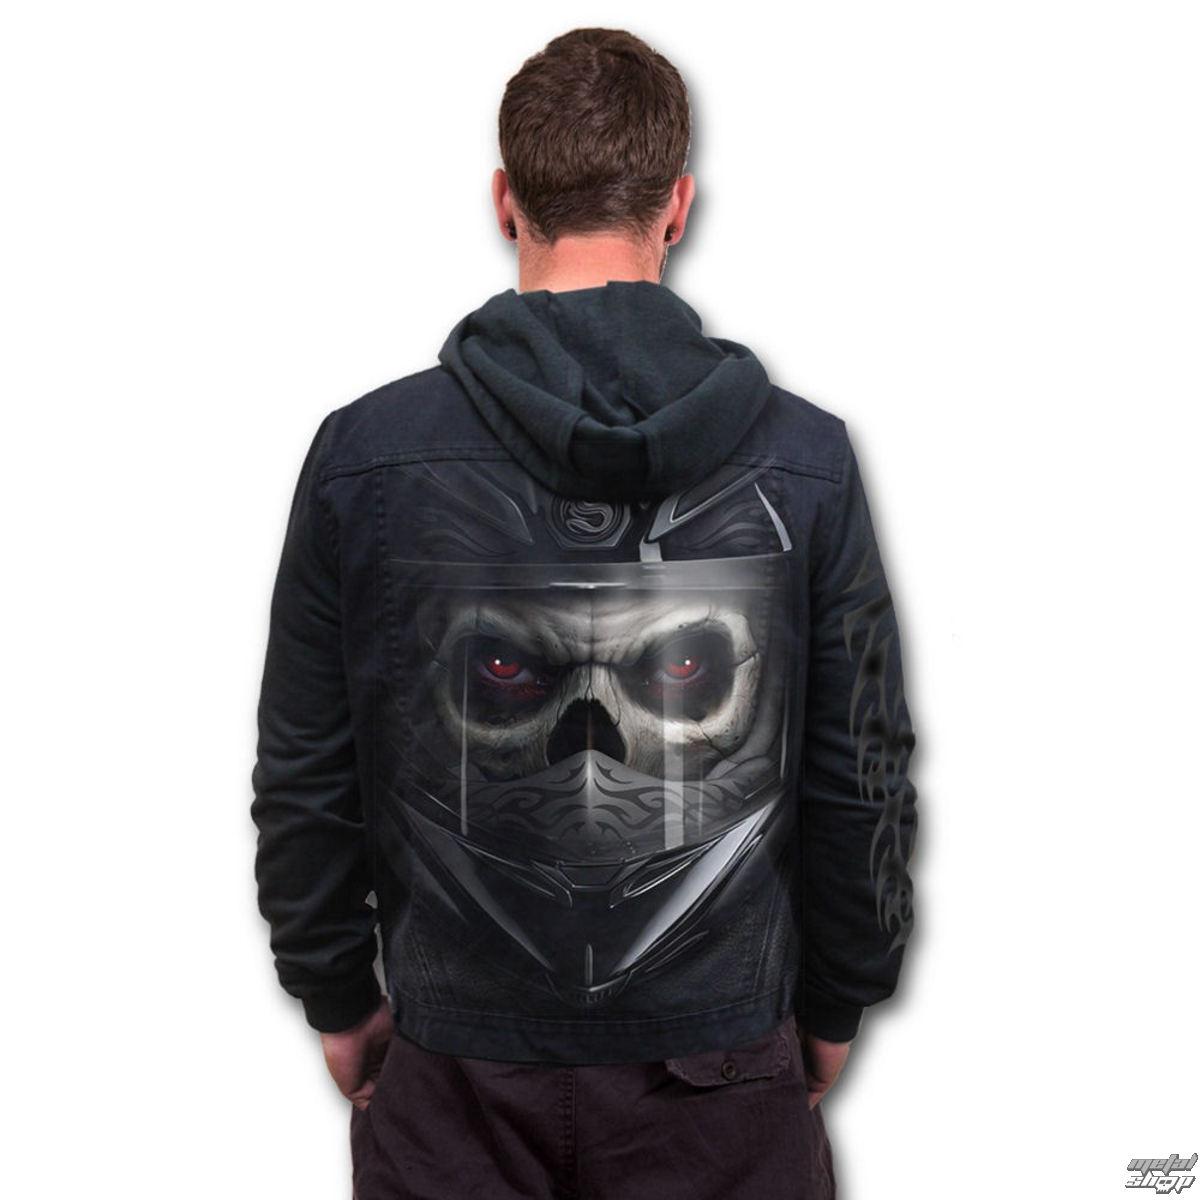 online store f61ee 88db6 giacca primaverile / autunnale uomo - Demon Biker - SPIRAL